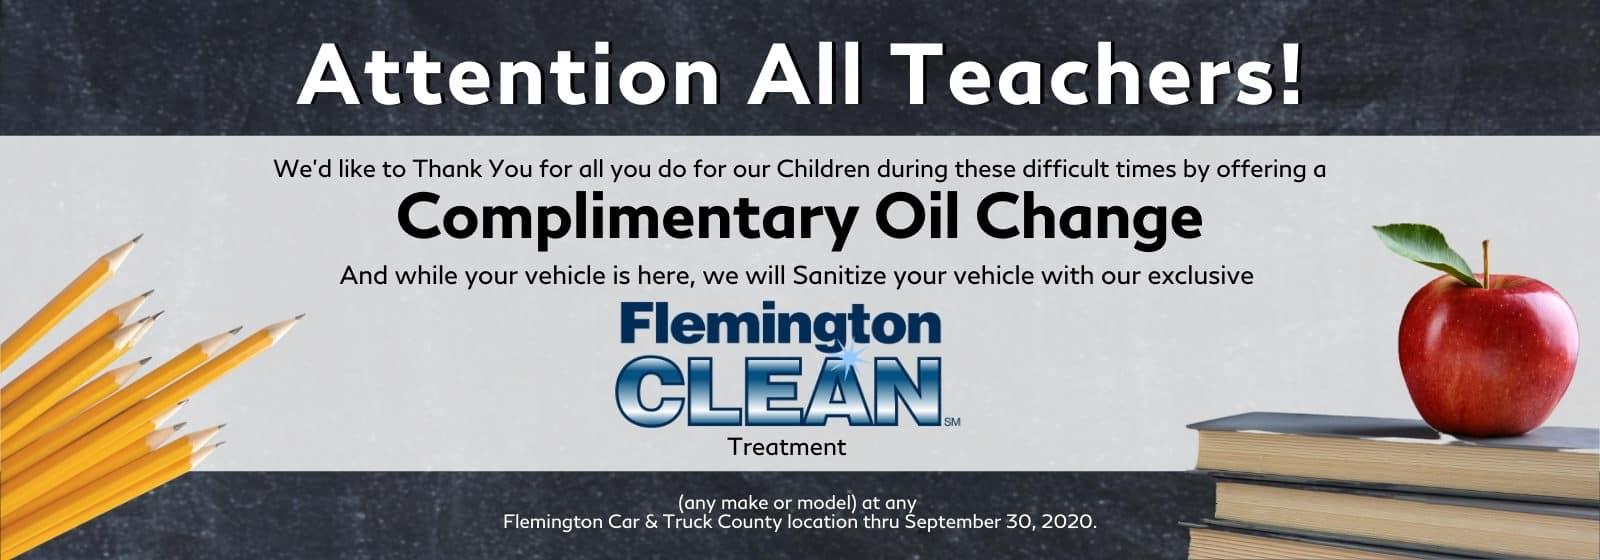 INFINITI Attention Teachers Flemington Clean_